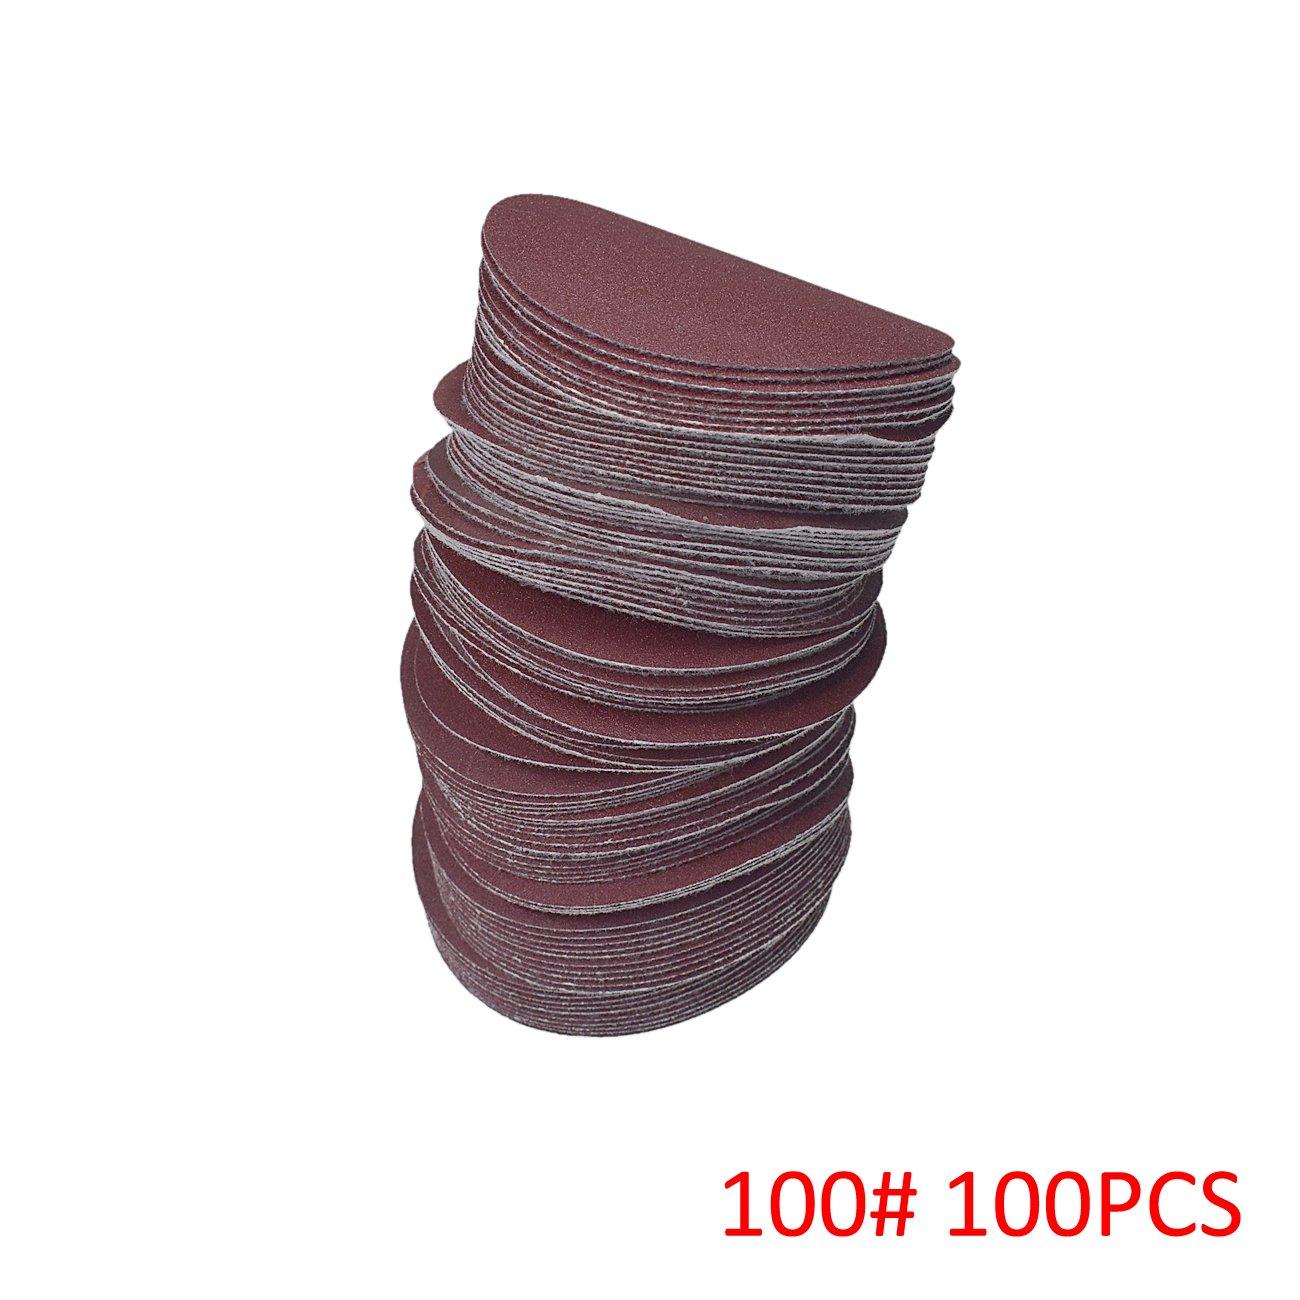 NAVARME 100pcs 100mm 4 Inch Sanding Disc 100 Grit Orbital Sander Pads Abrasive Sandpaper